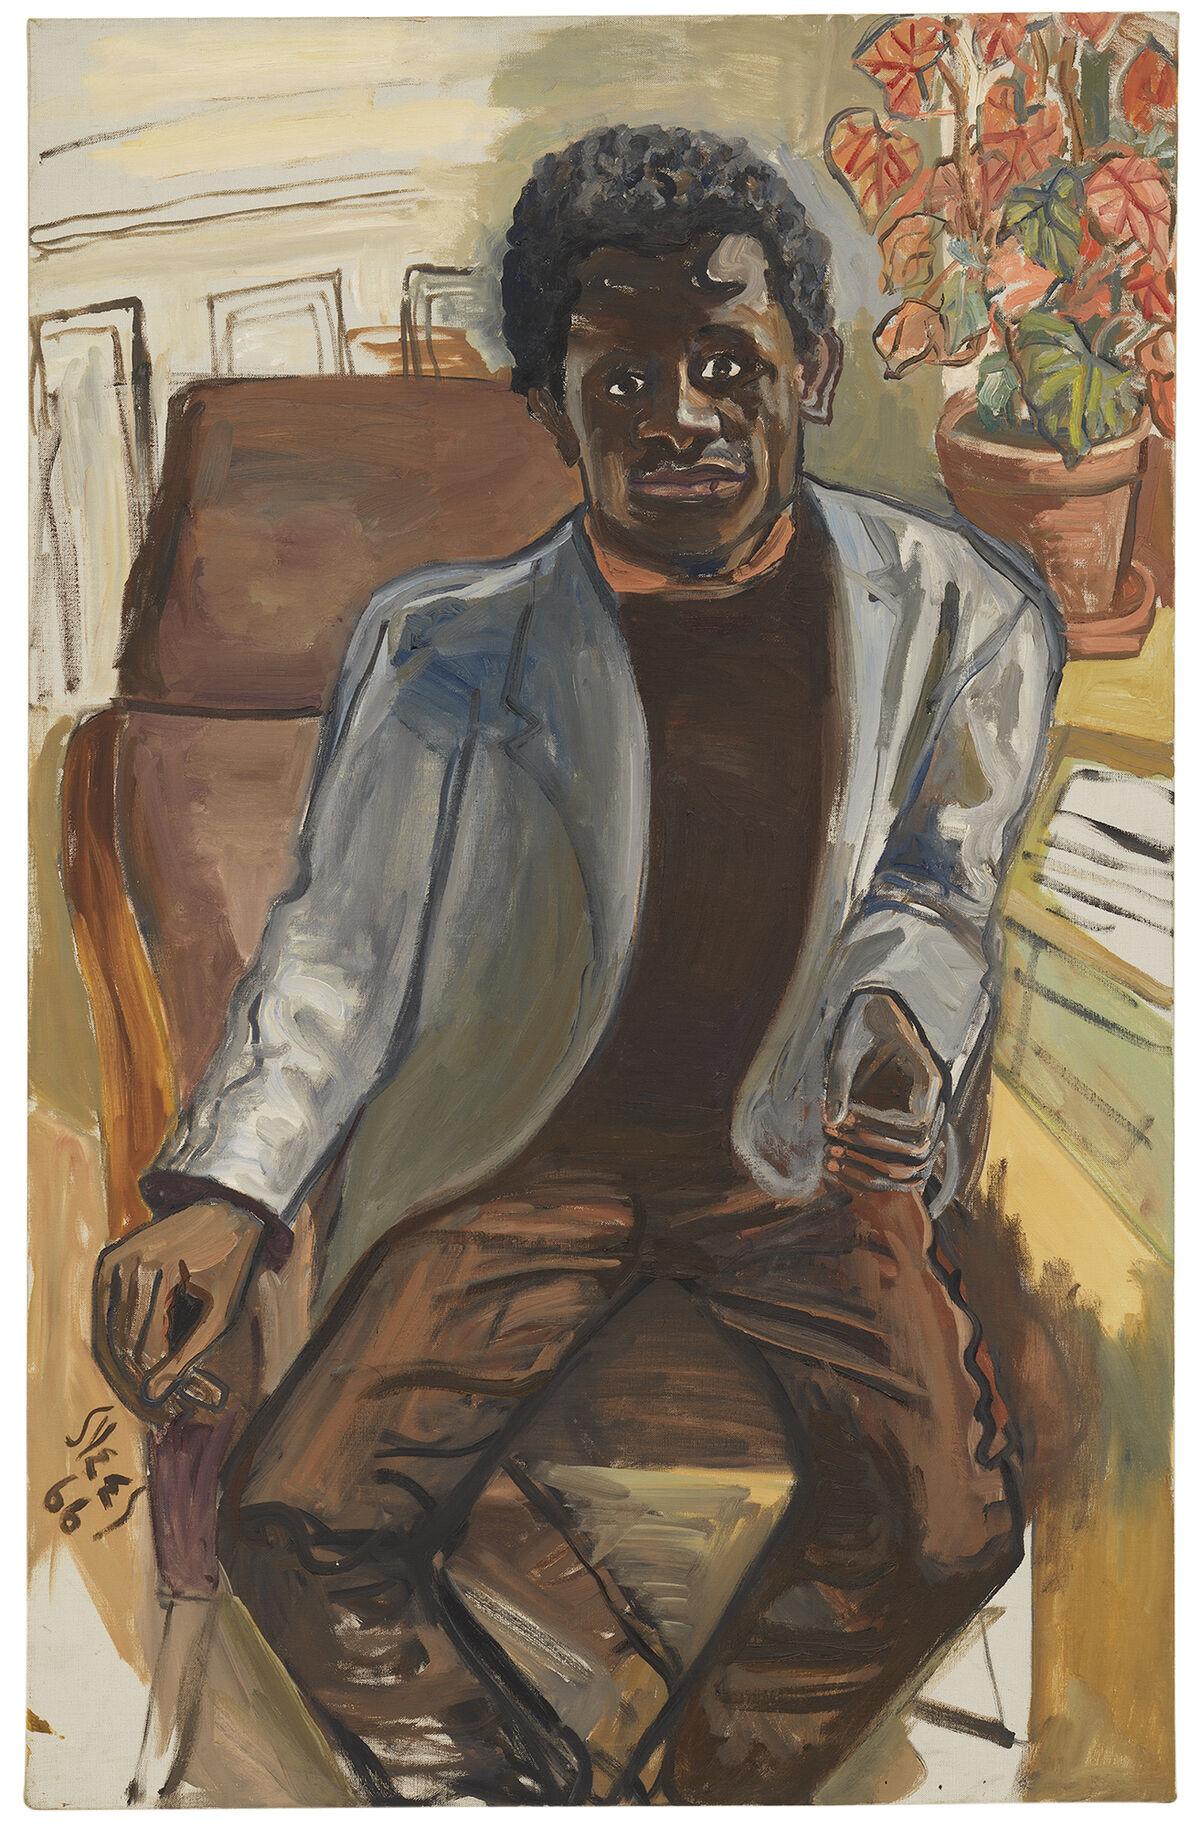 Alice Neel, Black Man, 1966.© The Estate ofAliceNeel. Courtesy David Zwirner, New York/London and Victoria Miro, London.